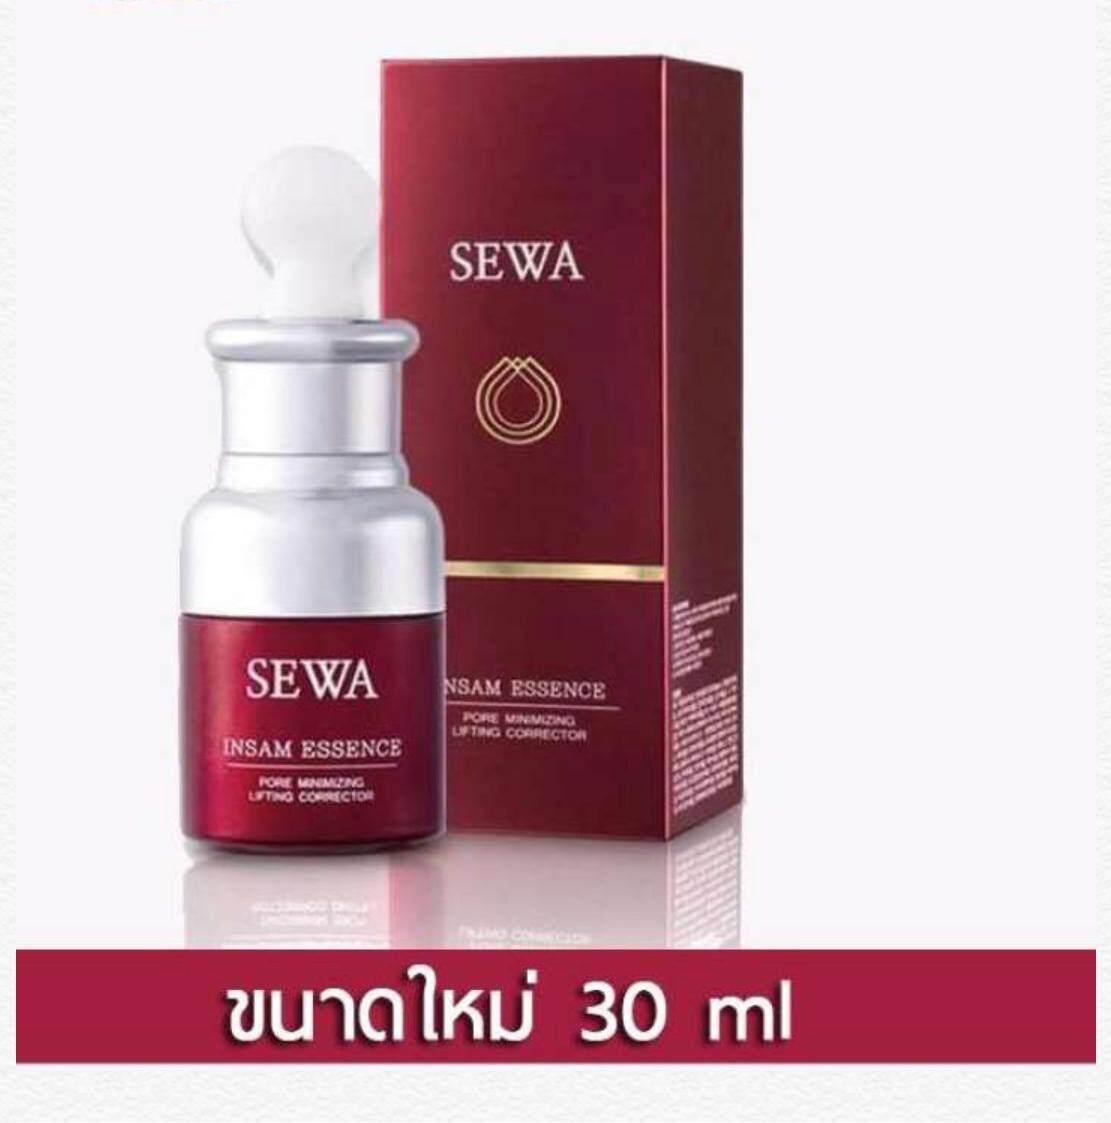 Sewa Insam Essence (1 ขวด = 30 Ml.) เซวา อินซัม เอสเซนส์ น้ำโสมเซวา บำรุงผิวชุ่มชื้น ลดเลือนริ้วรอย ลดจุดด่างดำ กระชับรูขุมขน .